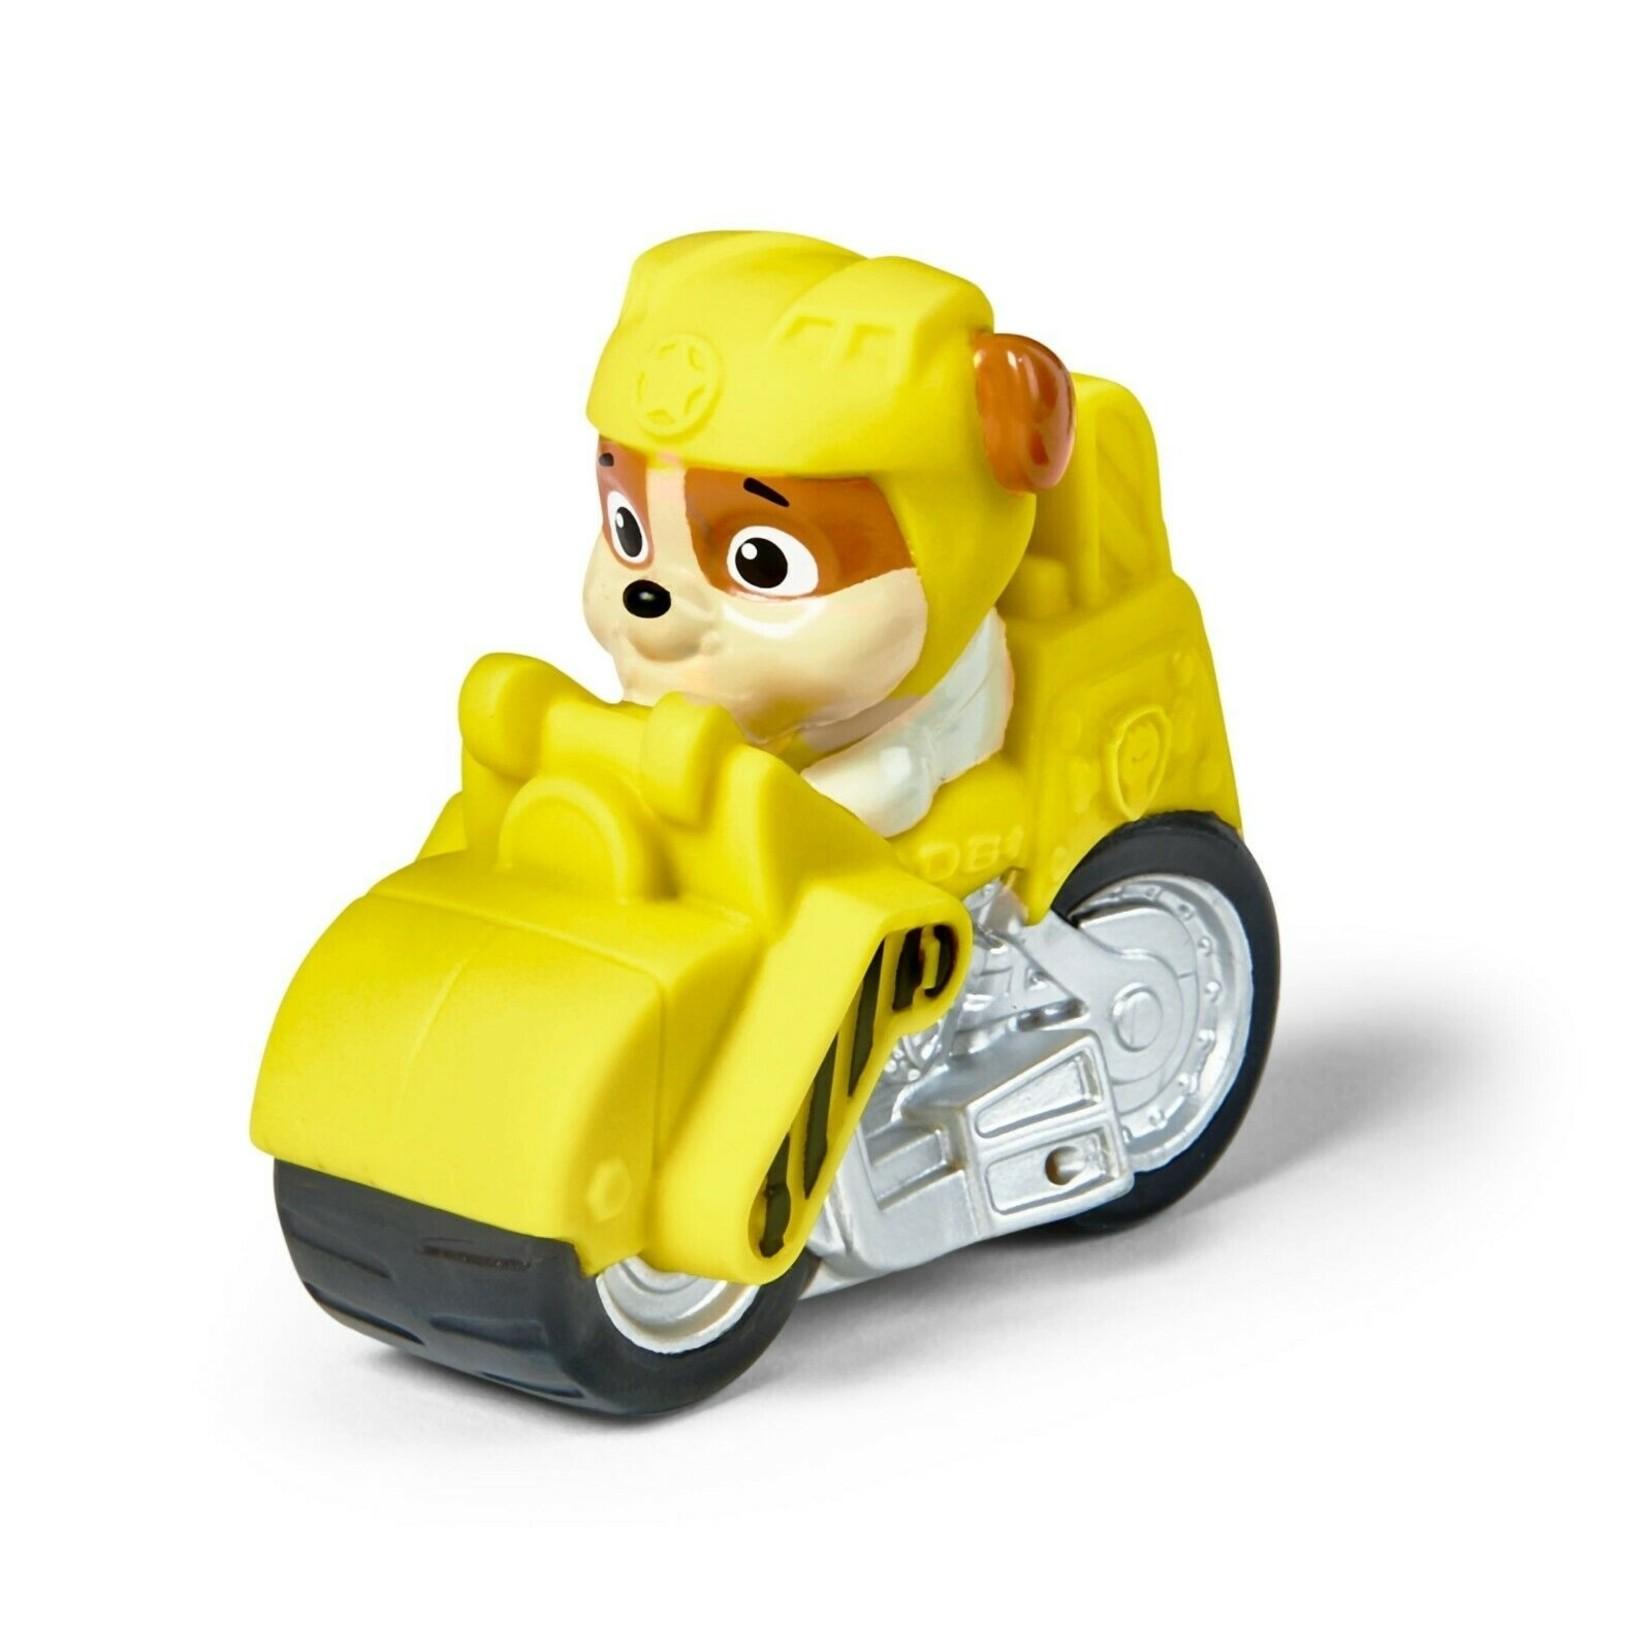 Spin Master Moto Themed Badspeeltje Rubble